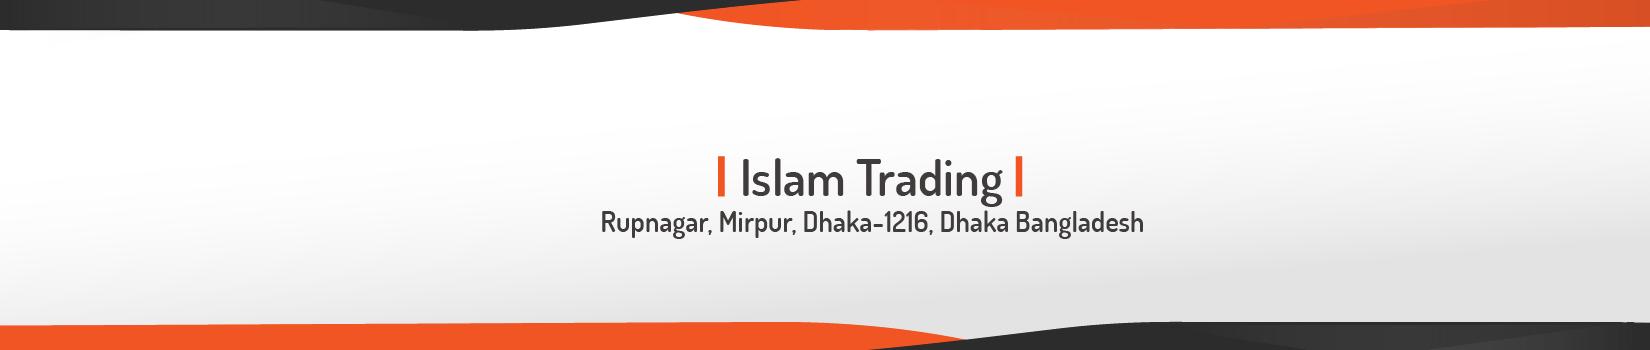 Islam Trading